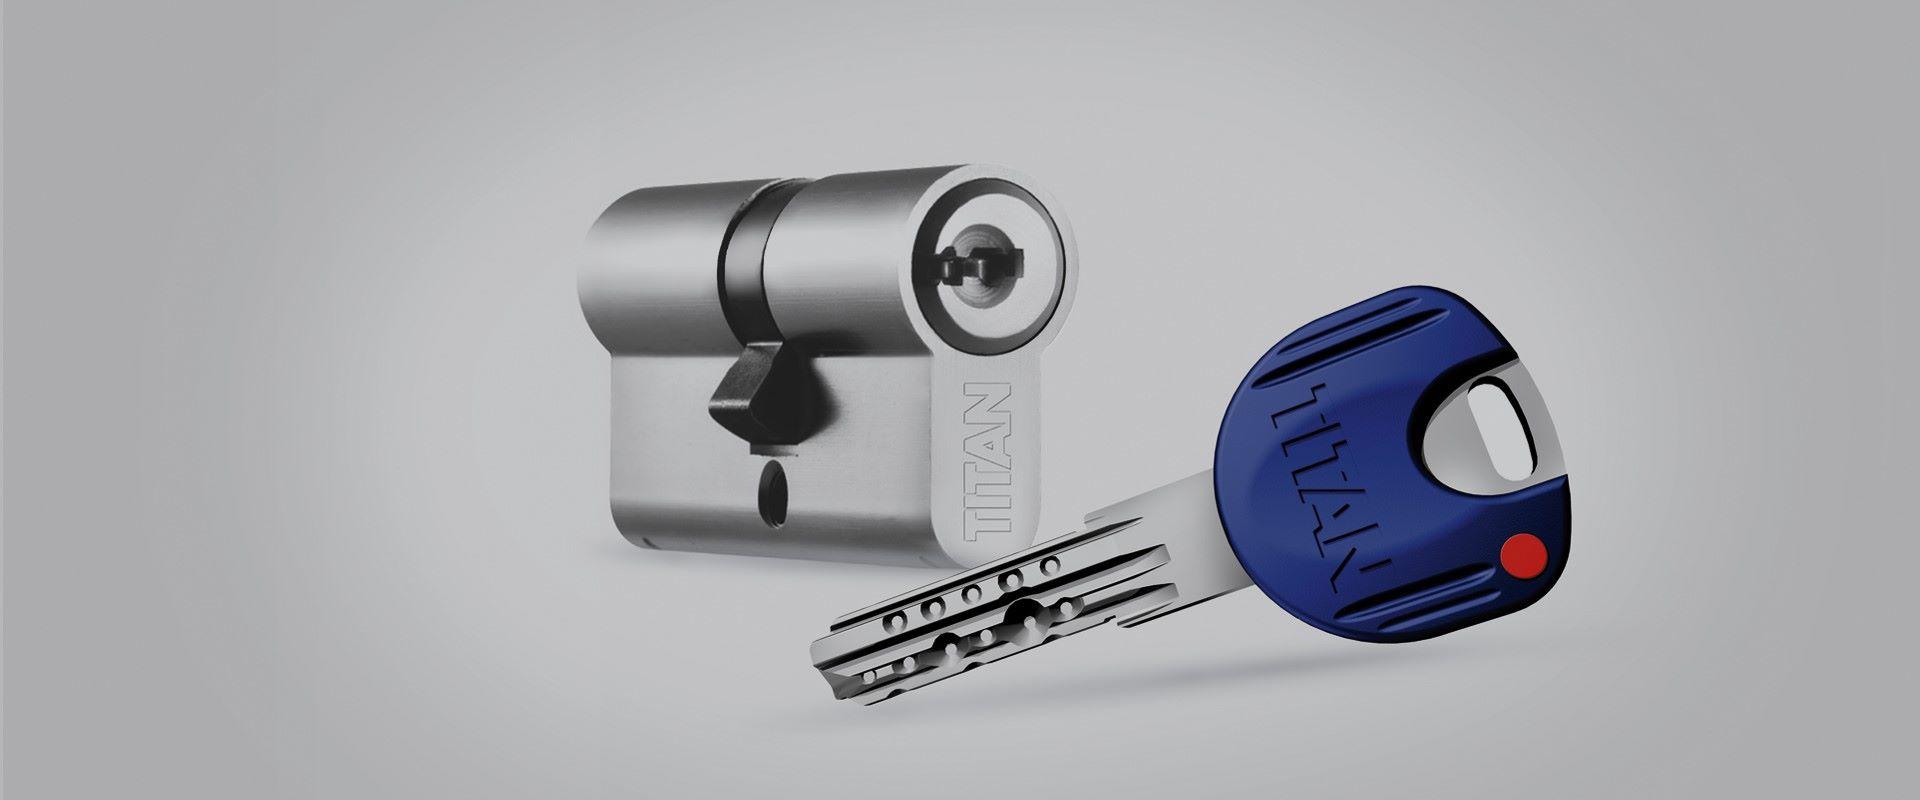 K66 cylinder and key